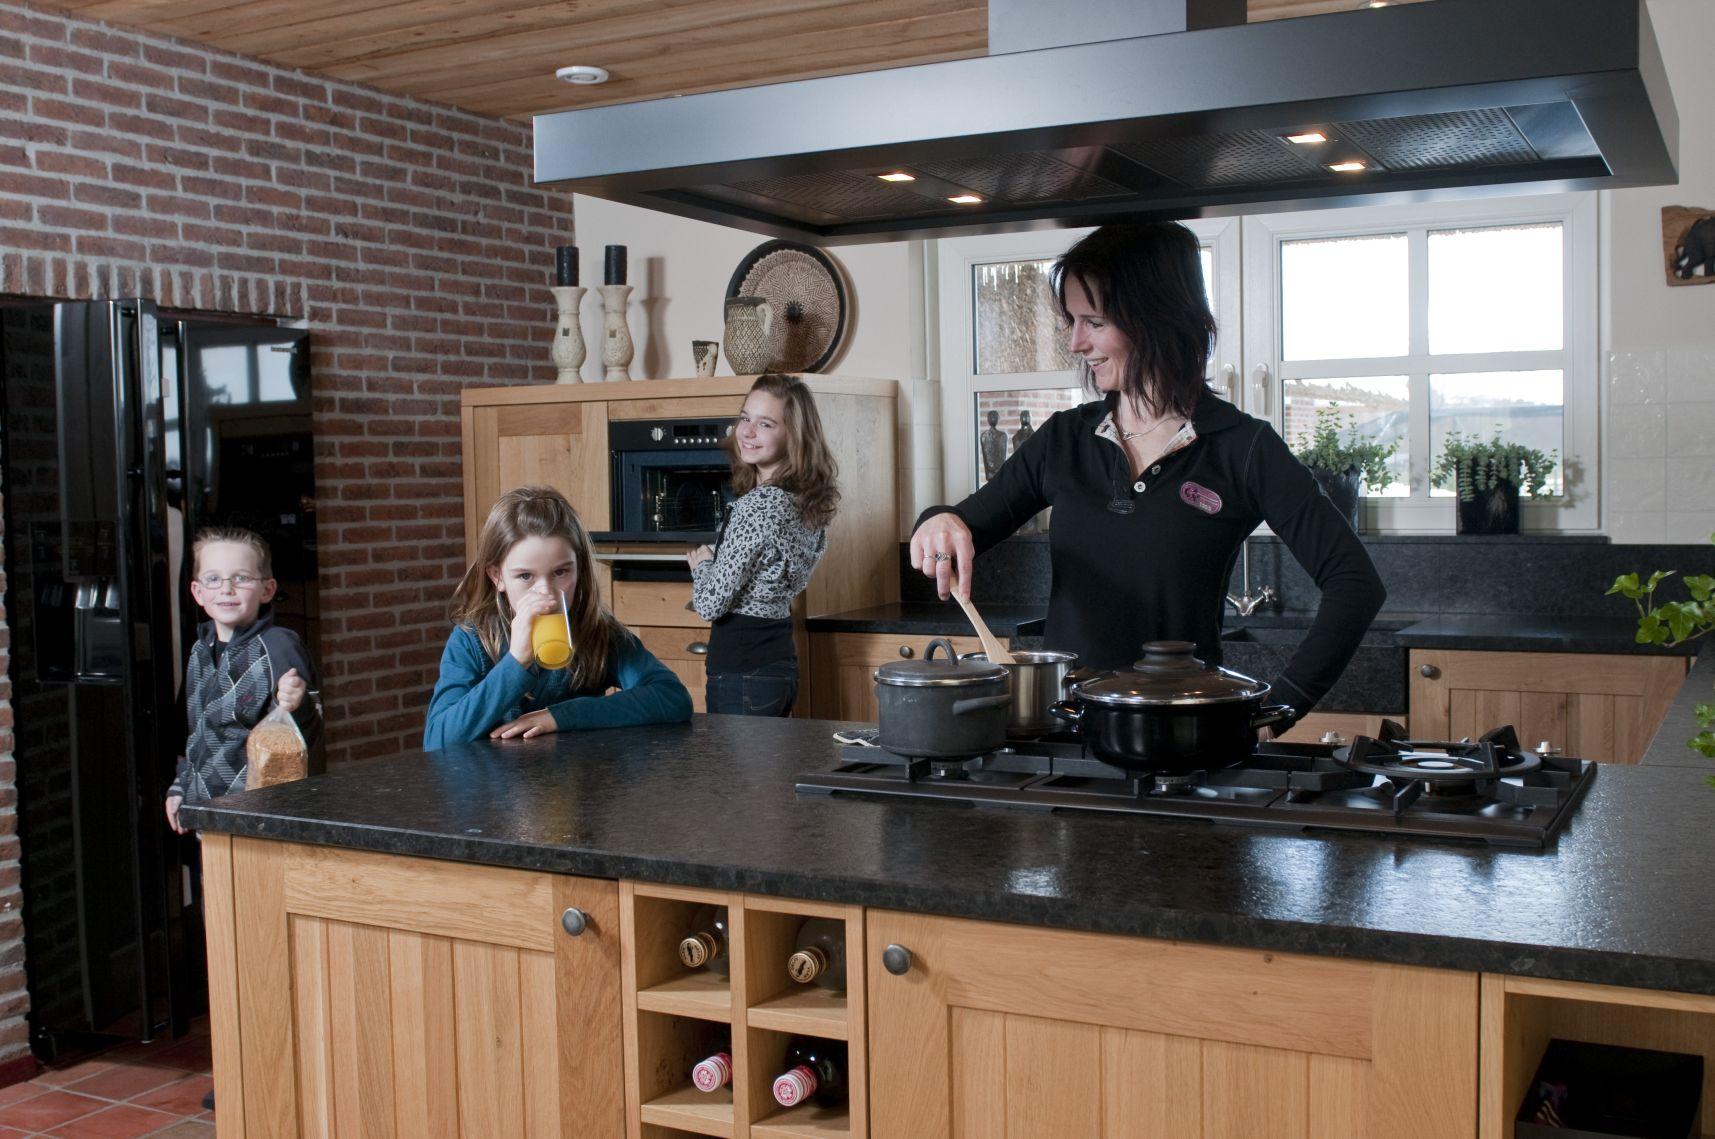 Huizinga keukens zwaagwesteinde